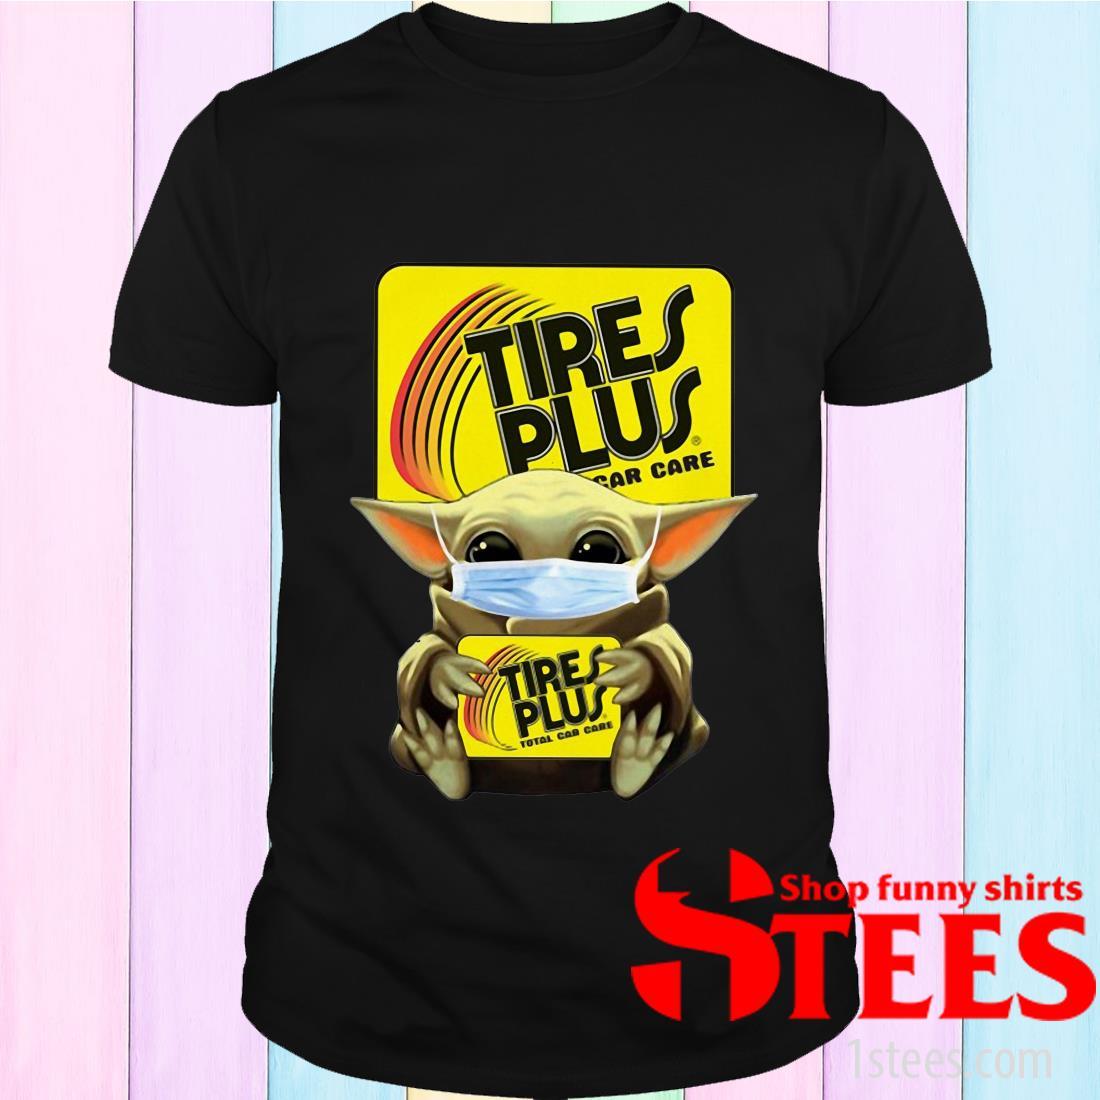 Star Wars Baby Yoda Hug Tires Plus Total Car Care Covid-19 T-Shirt